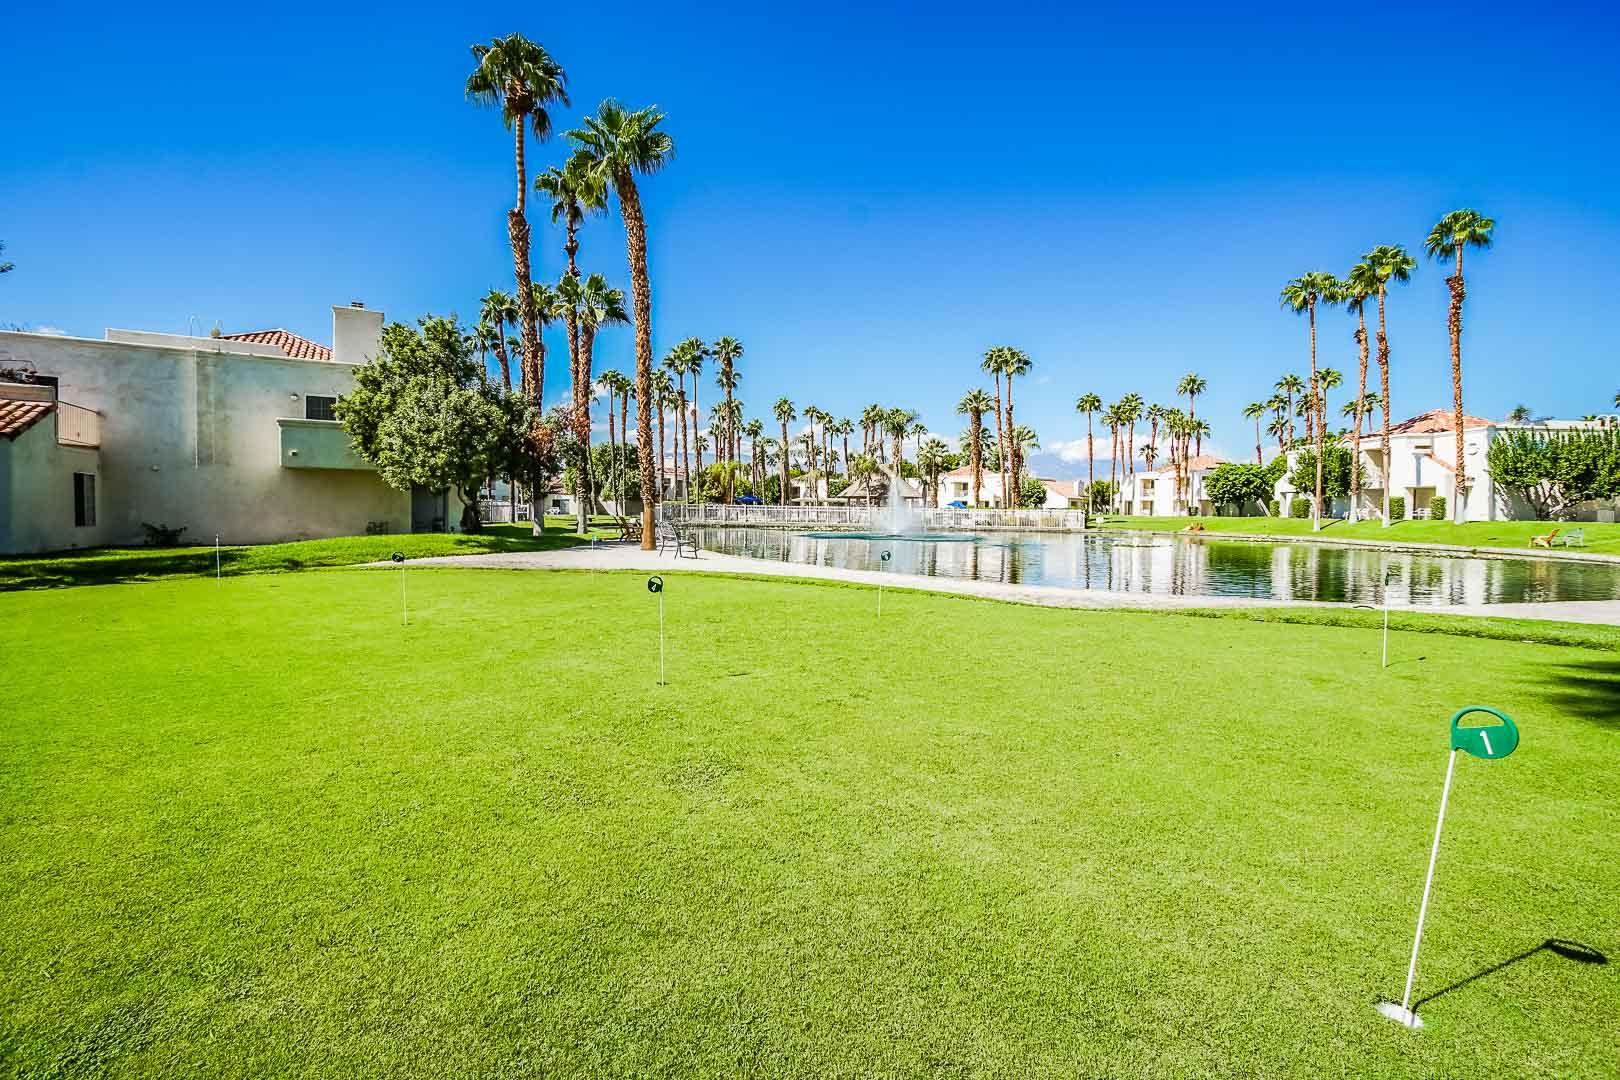 A scenic view of the resort exterior at VRI Americas' Desert Breezes Resort in California